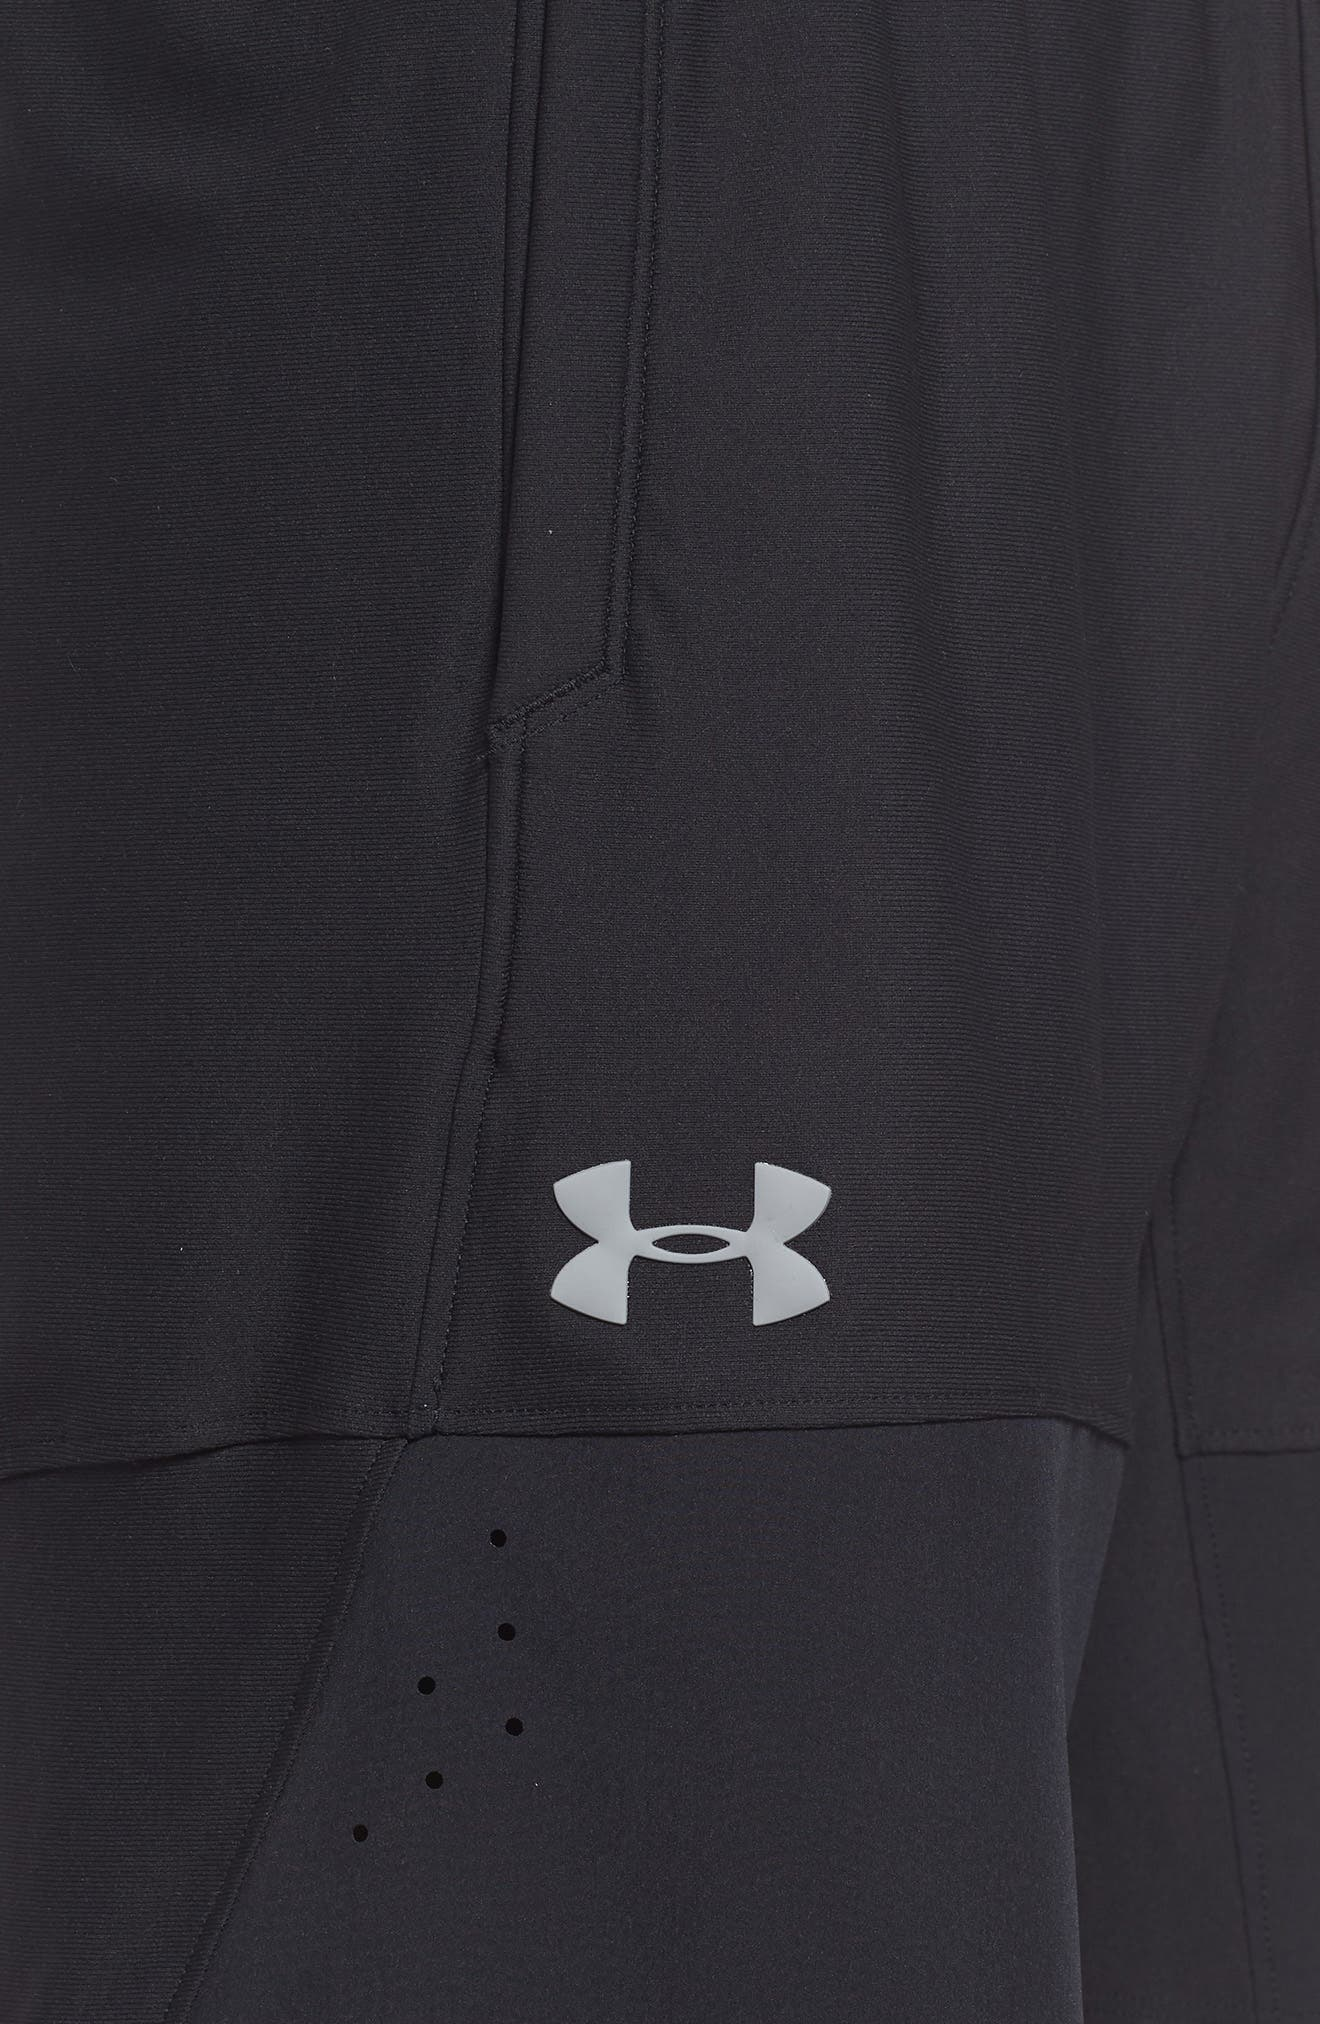 Threadborne Vanish Fitted Shorts,                             Alternate thumbnail 4, color,                             BLACK